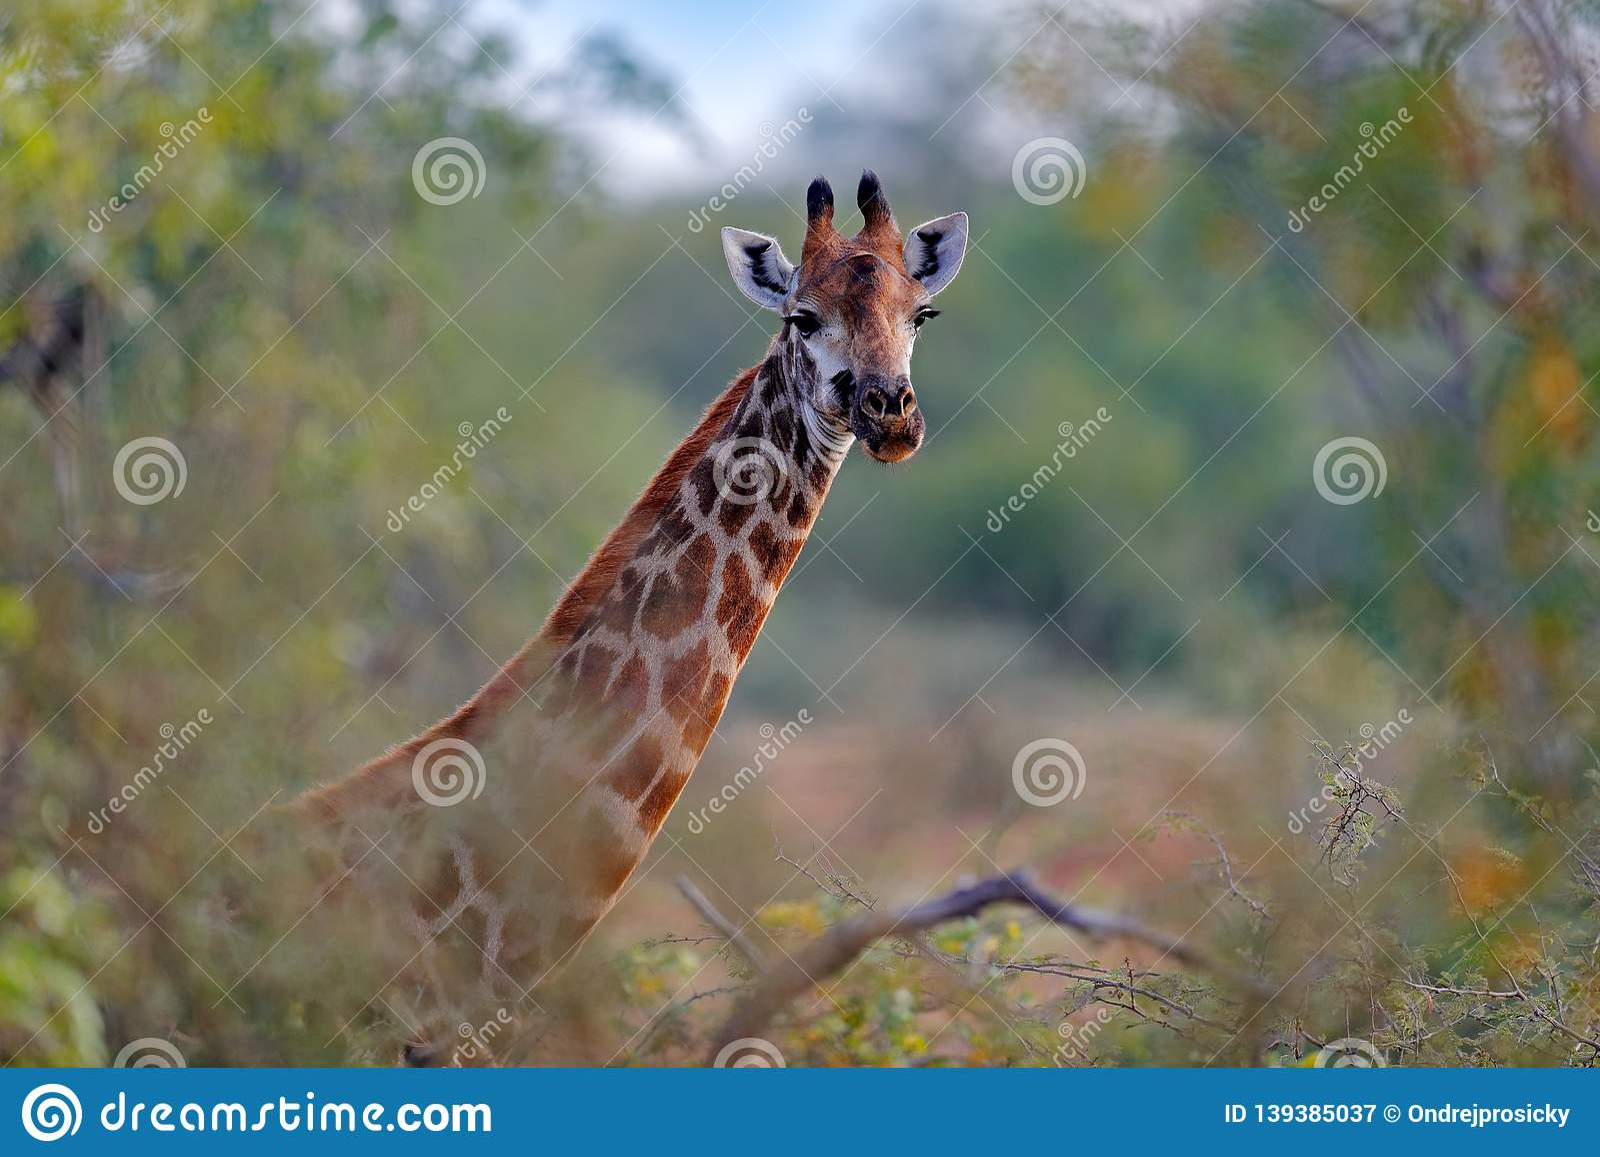 Giraffe Hidden In Orange And Green Autumn Vegetation Giraffes Head